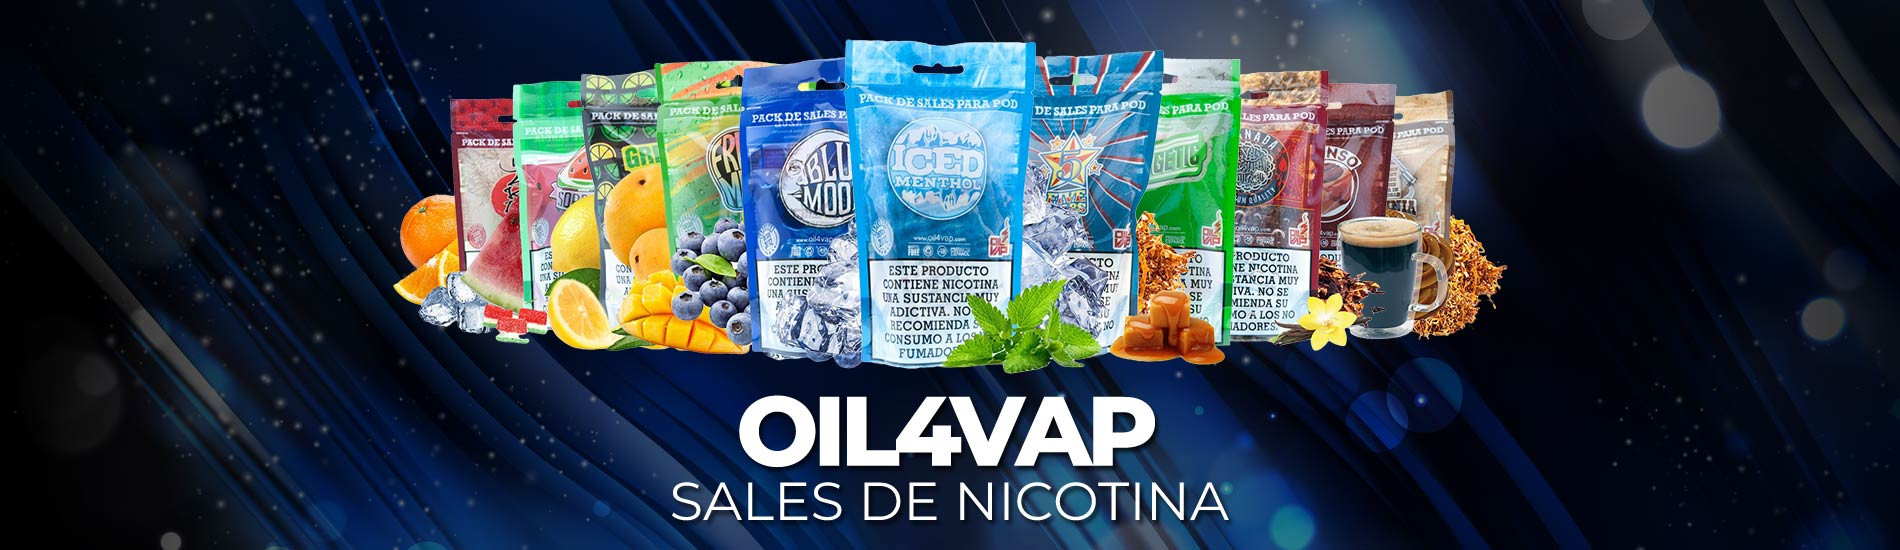 Sales de Nicotina OIL4VAP